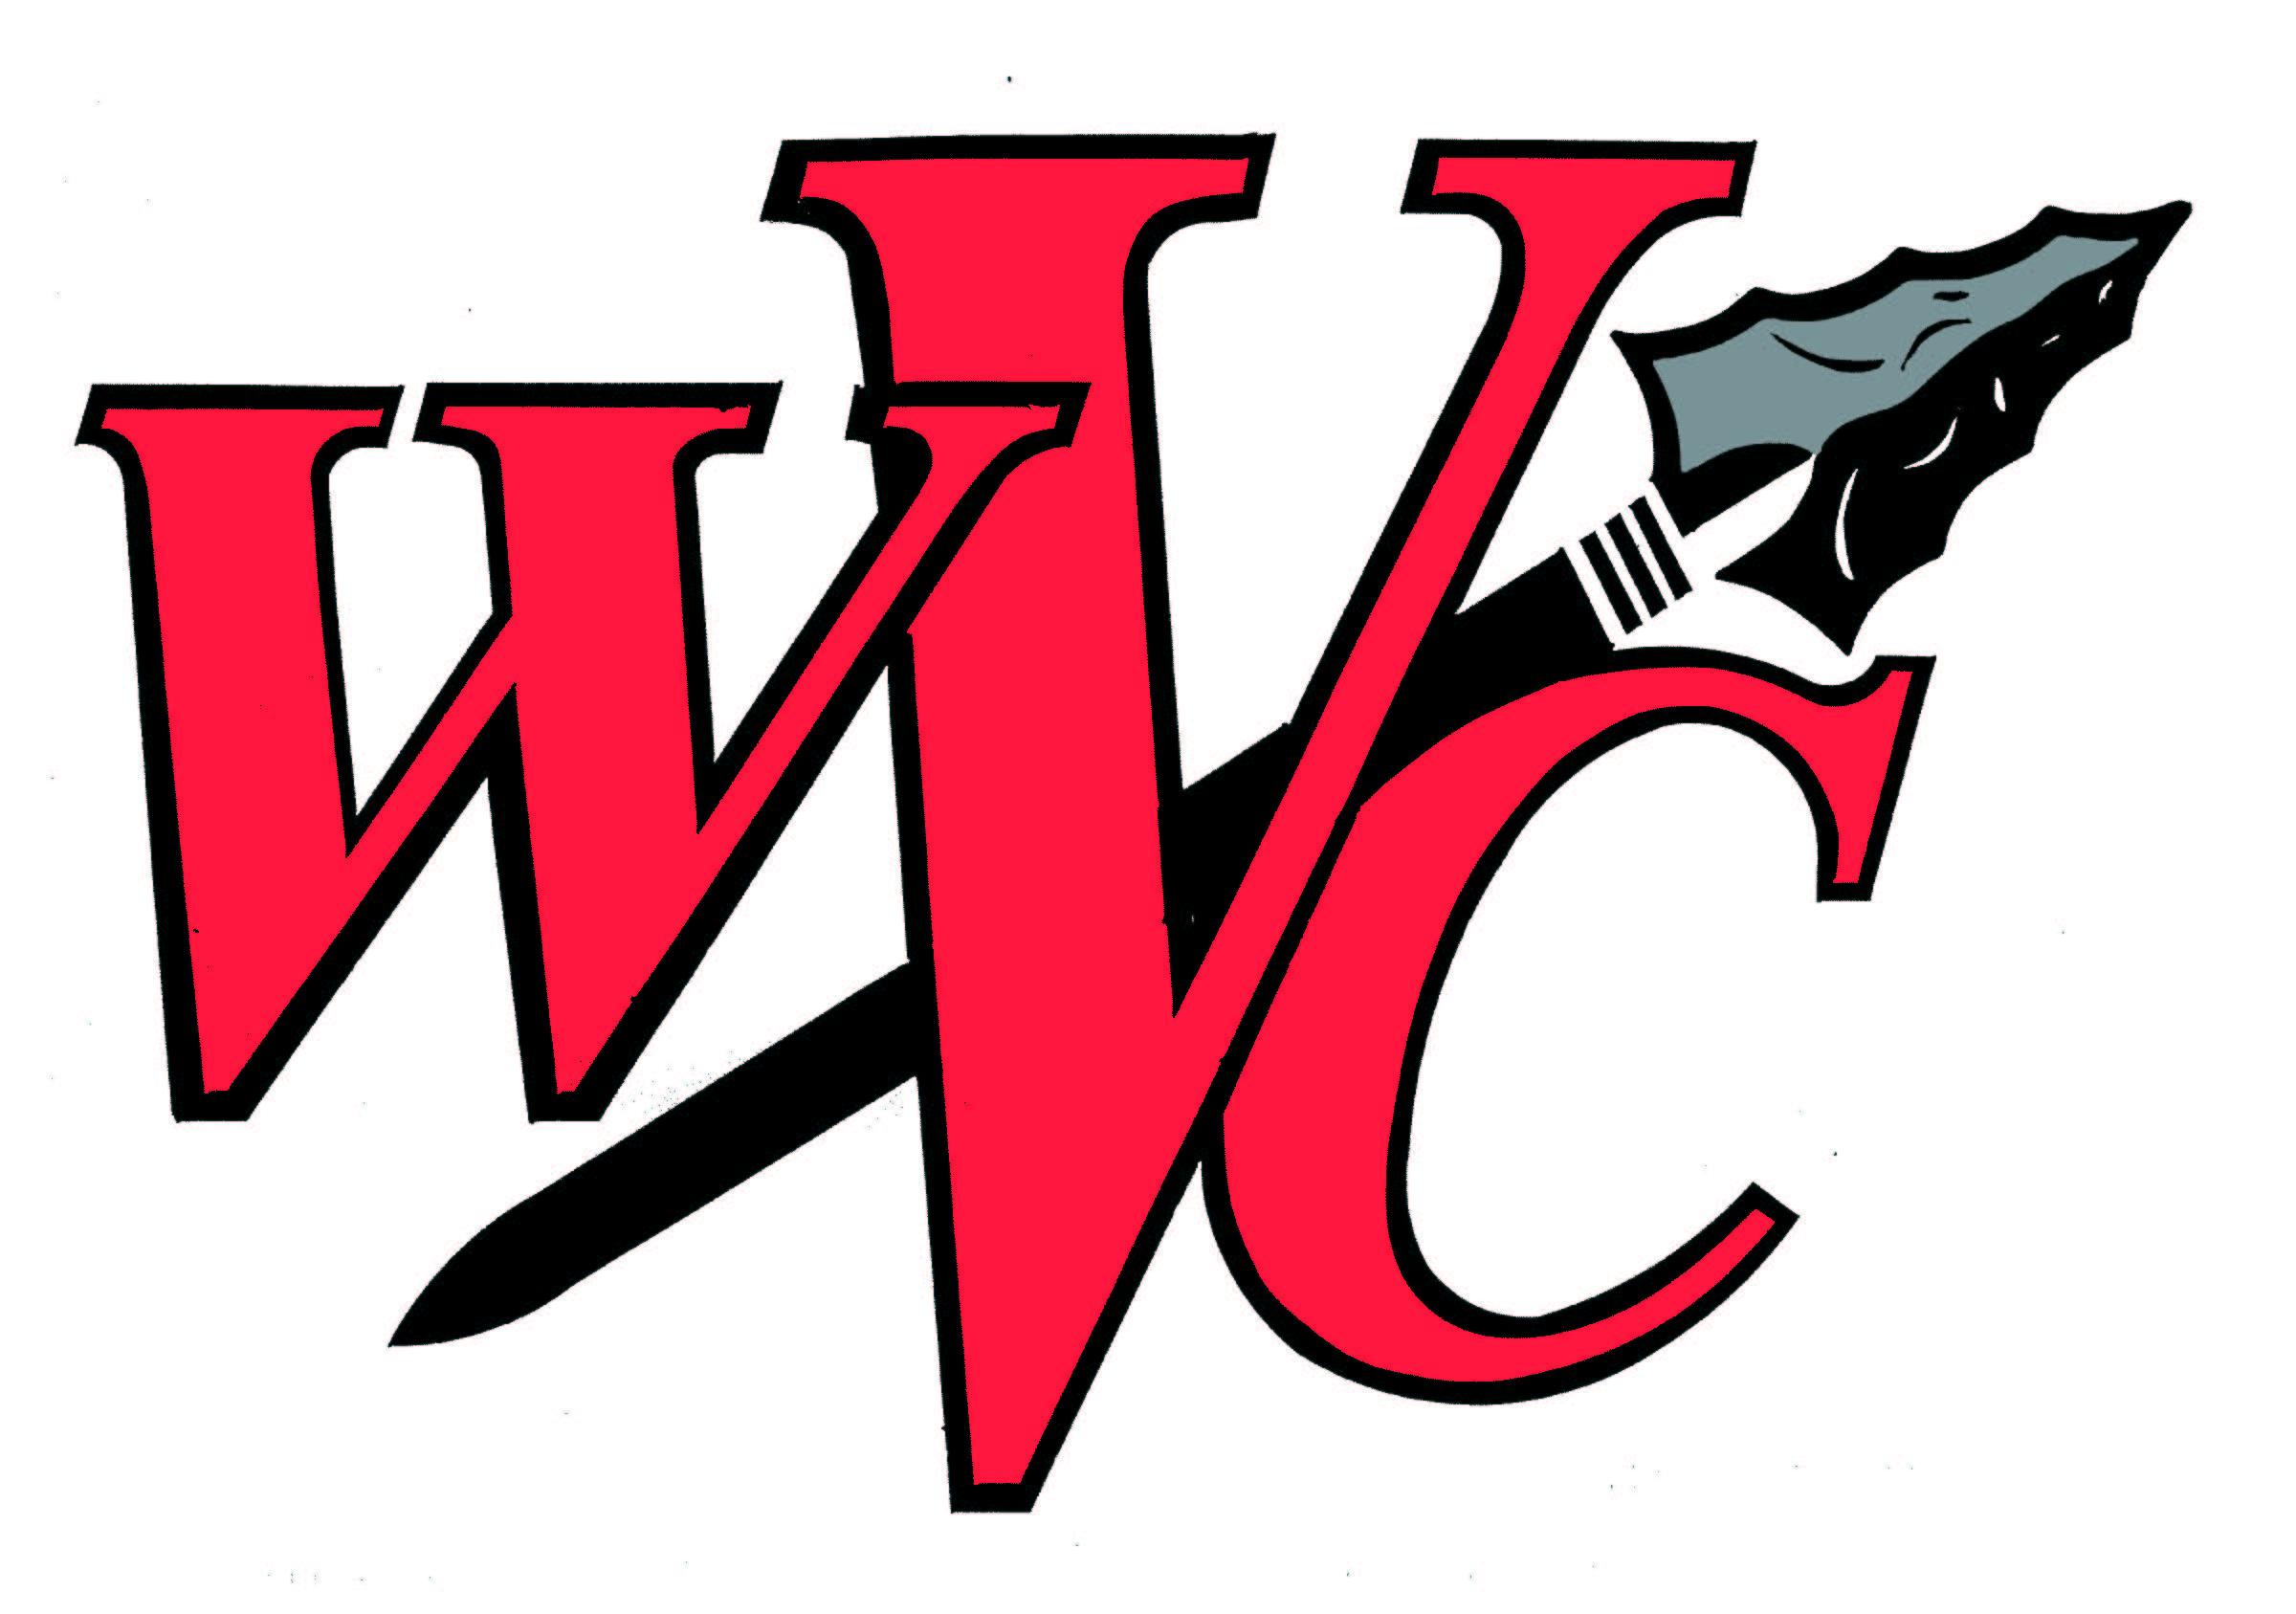 WVC_Sports (1).jpg